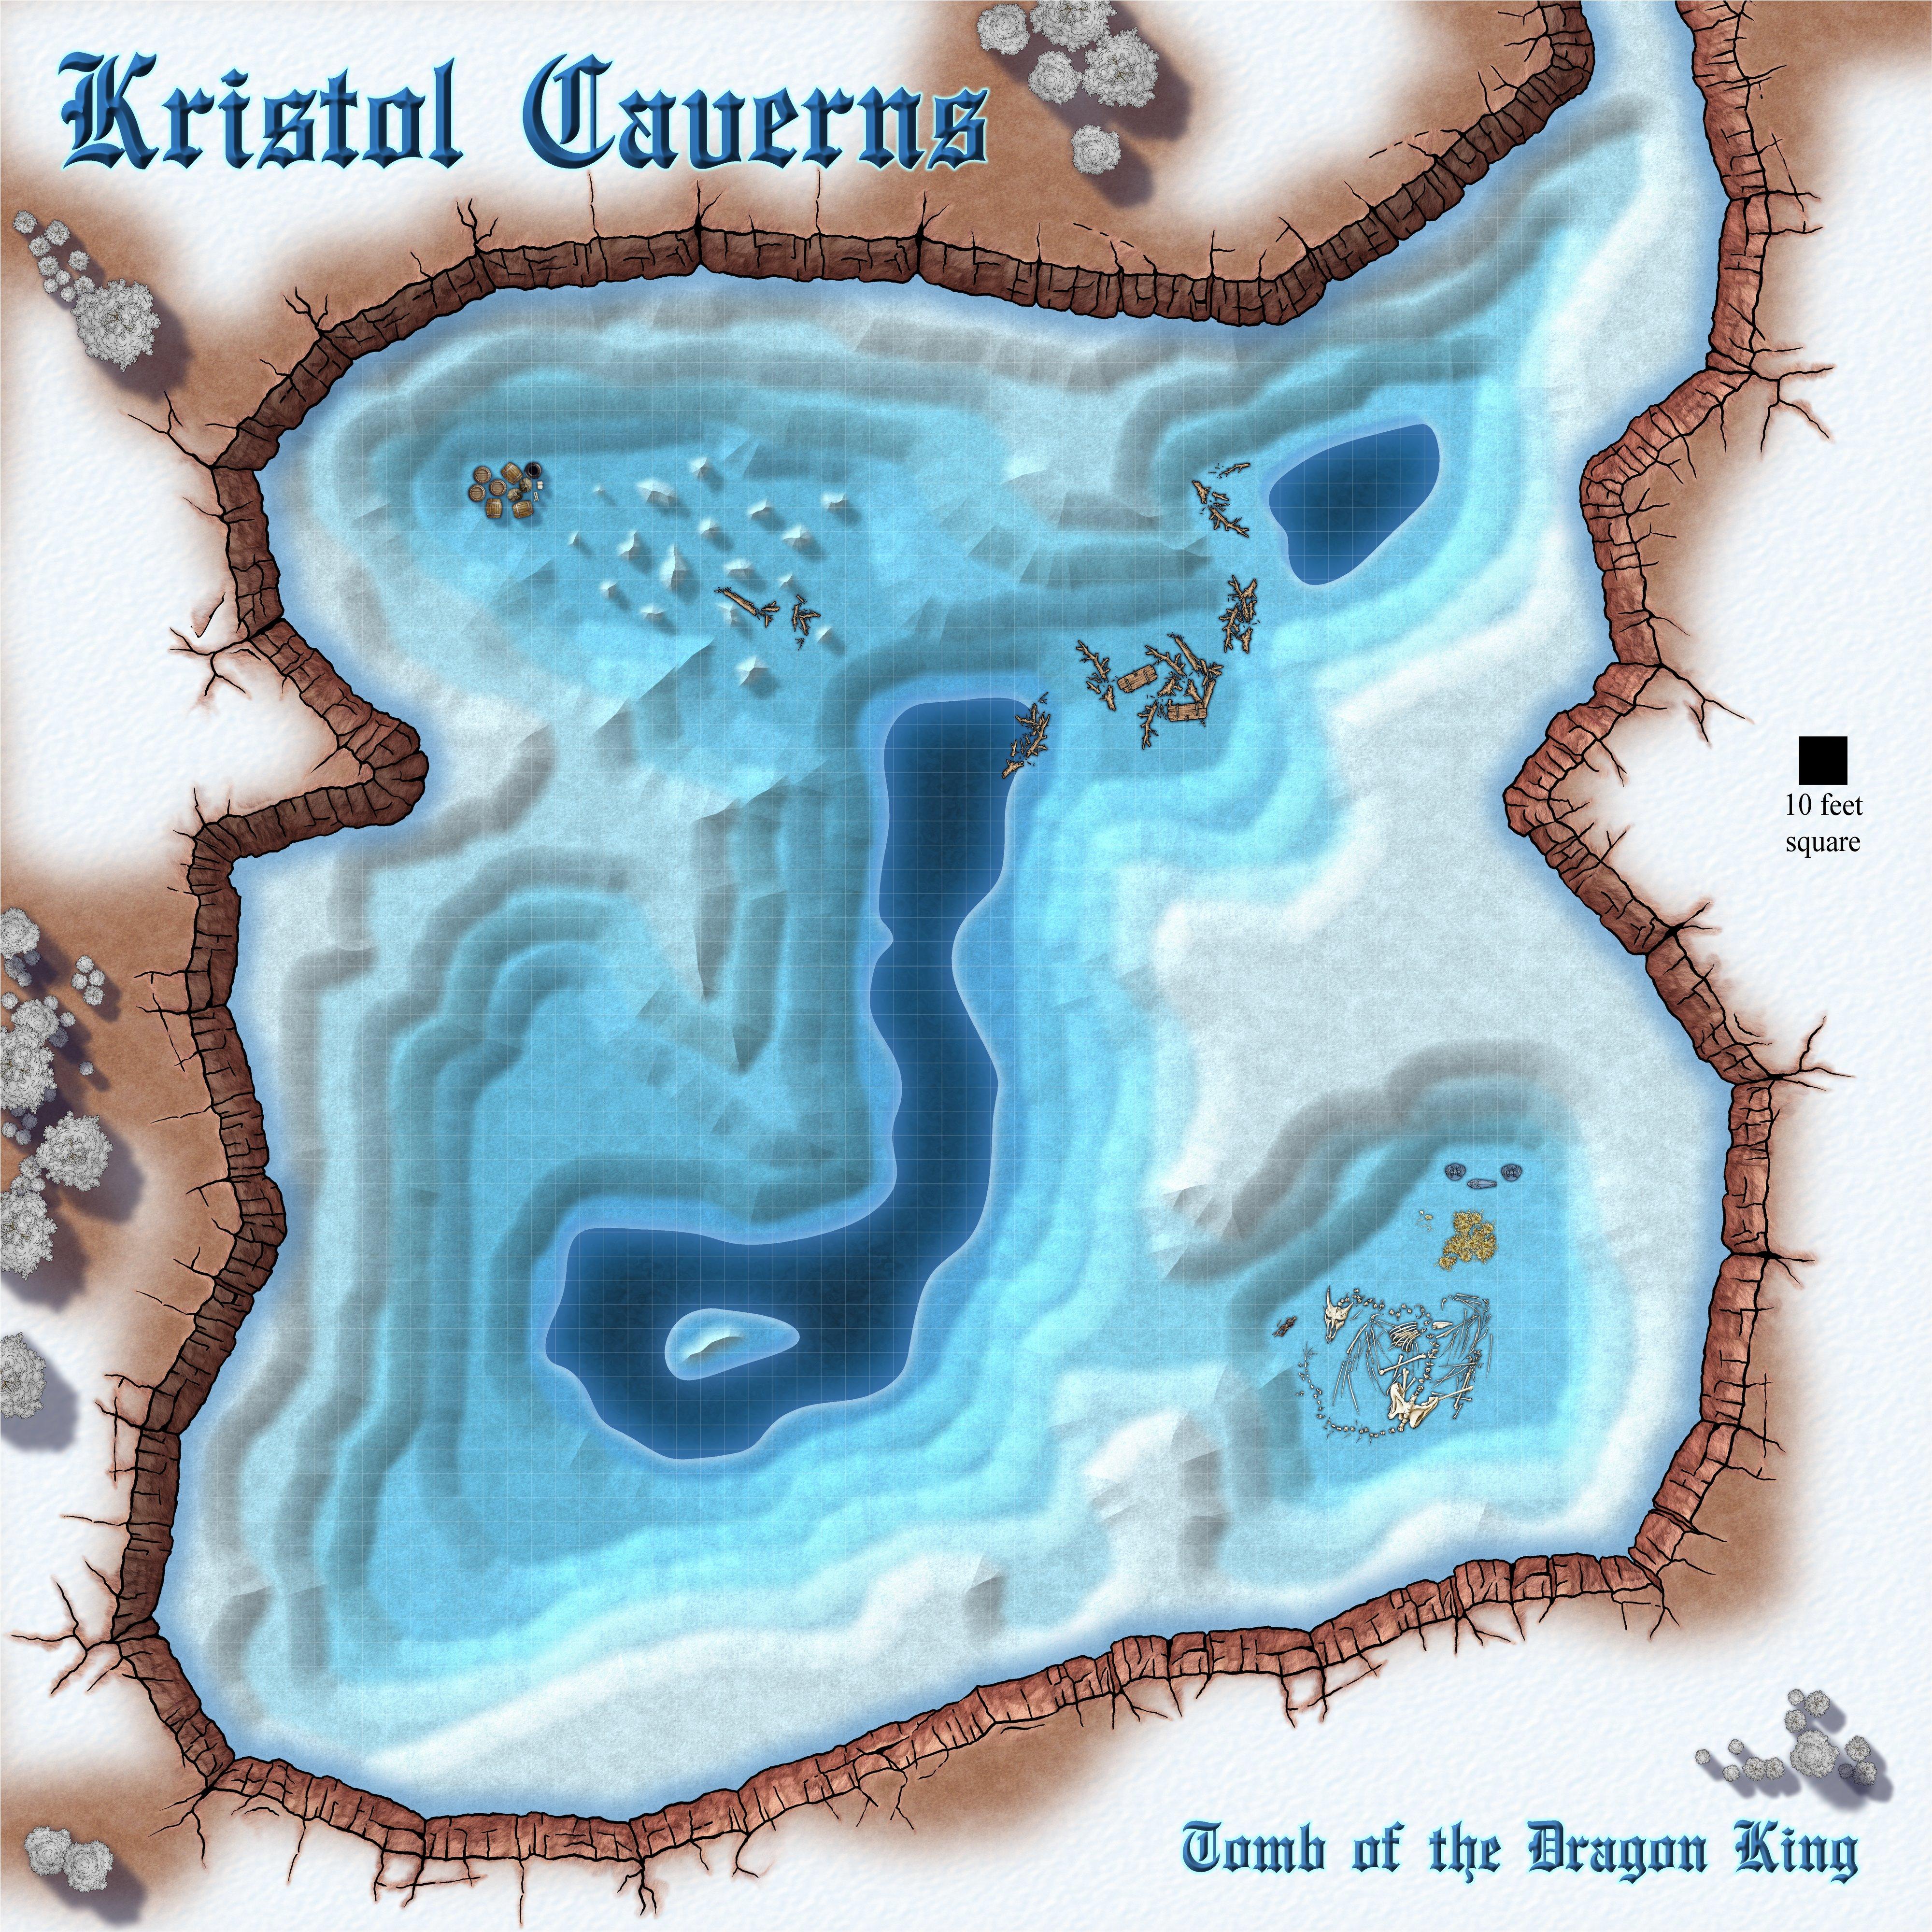 Kristol Caverns w grid.JPG